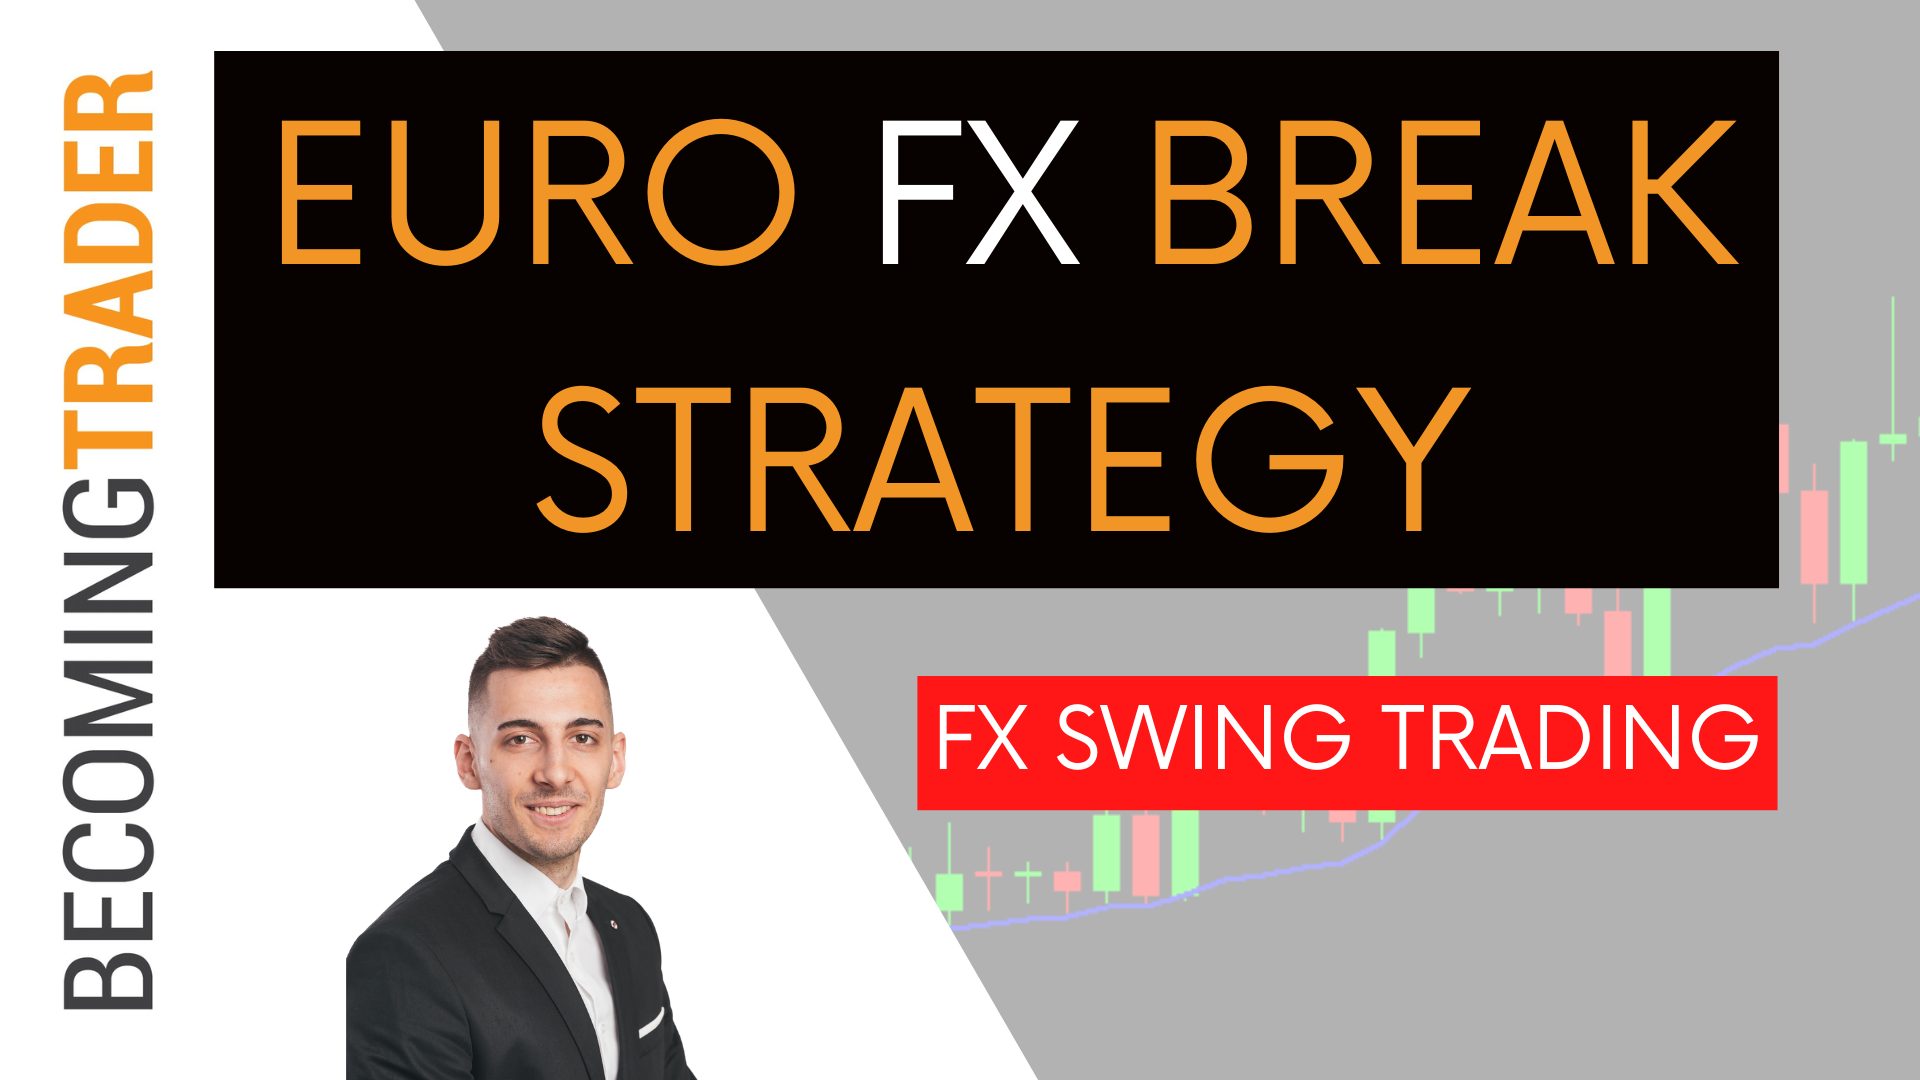 EUR/USD Forex Breakout Strategy | Live Forex Swing Trading Idea